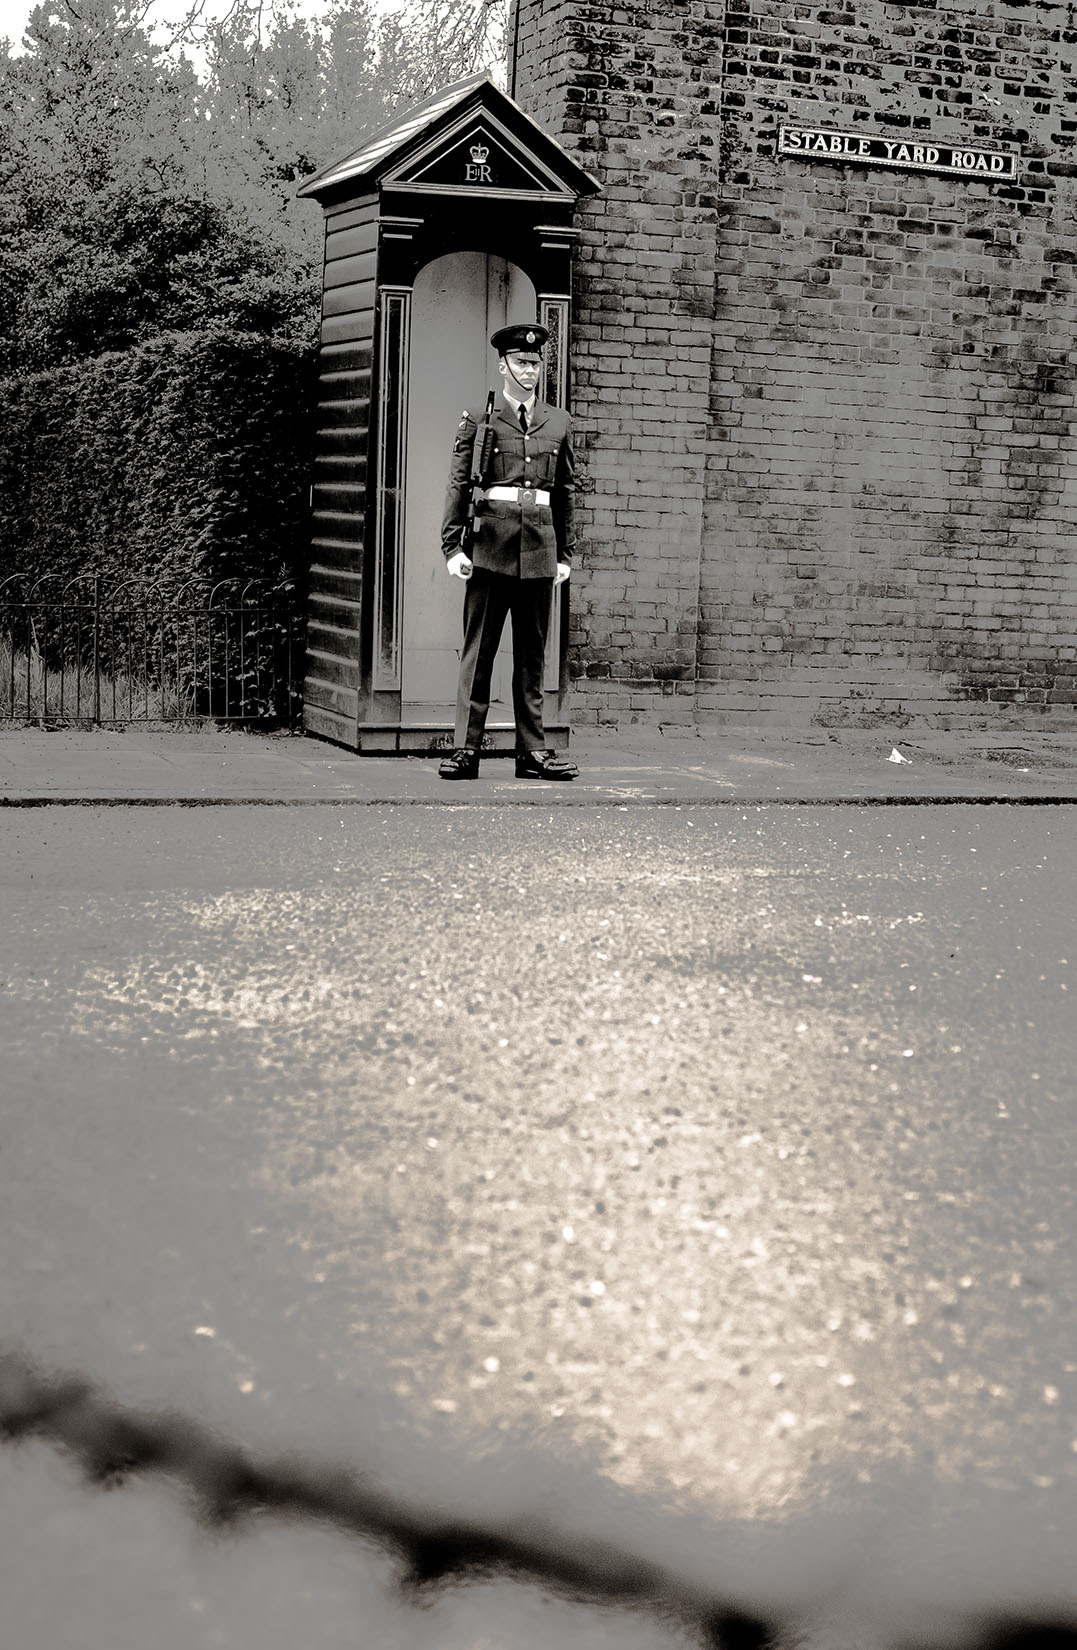 London street, may 2014